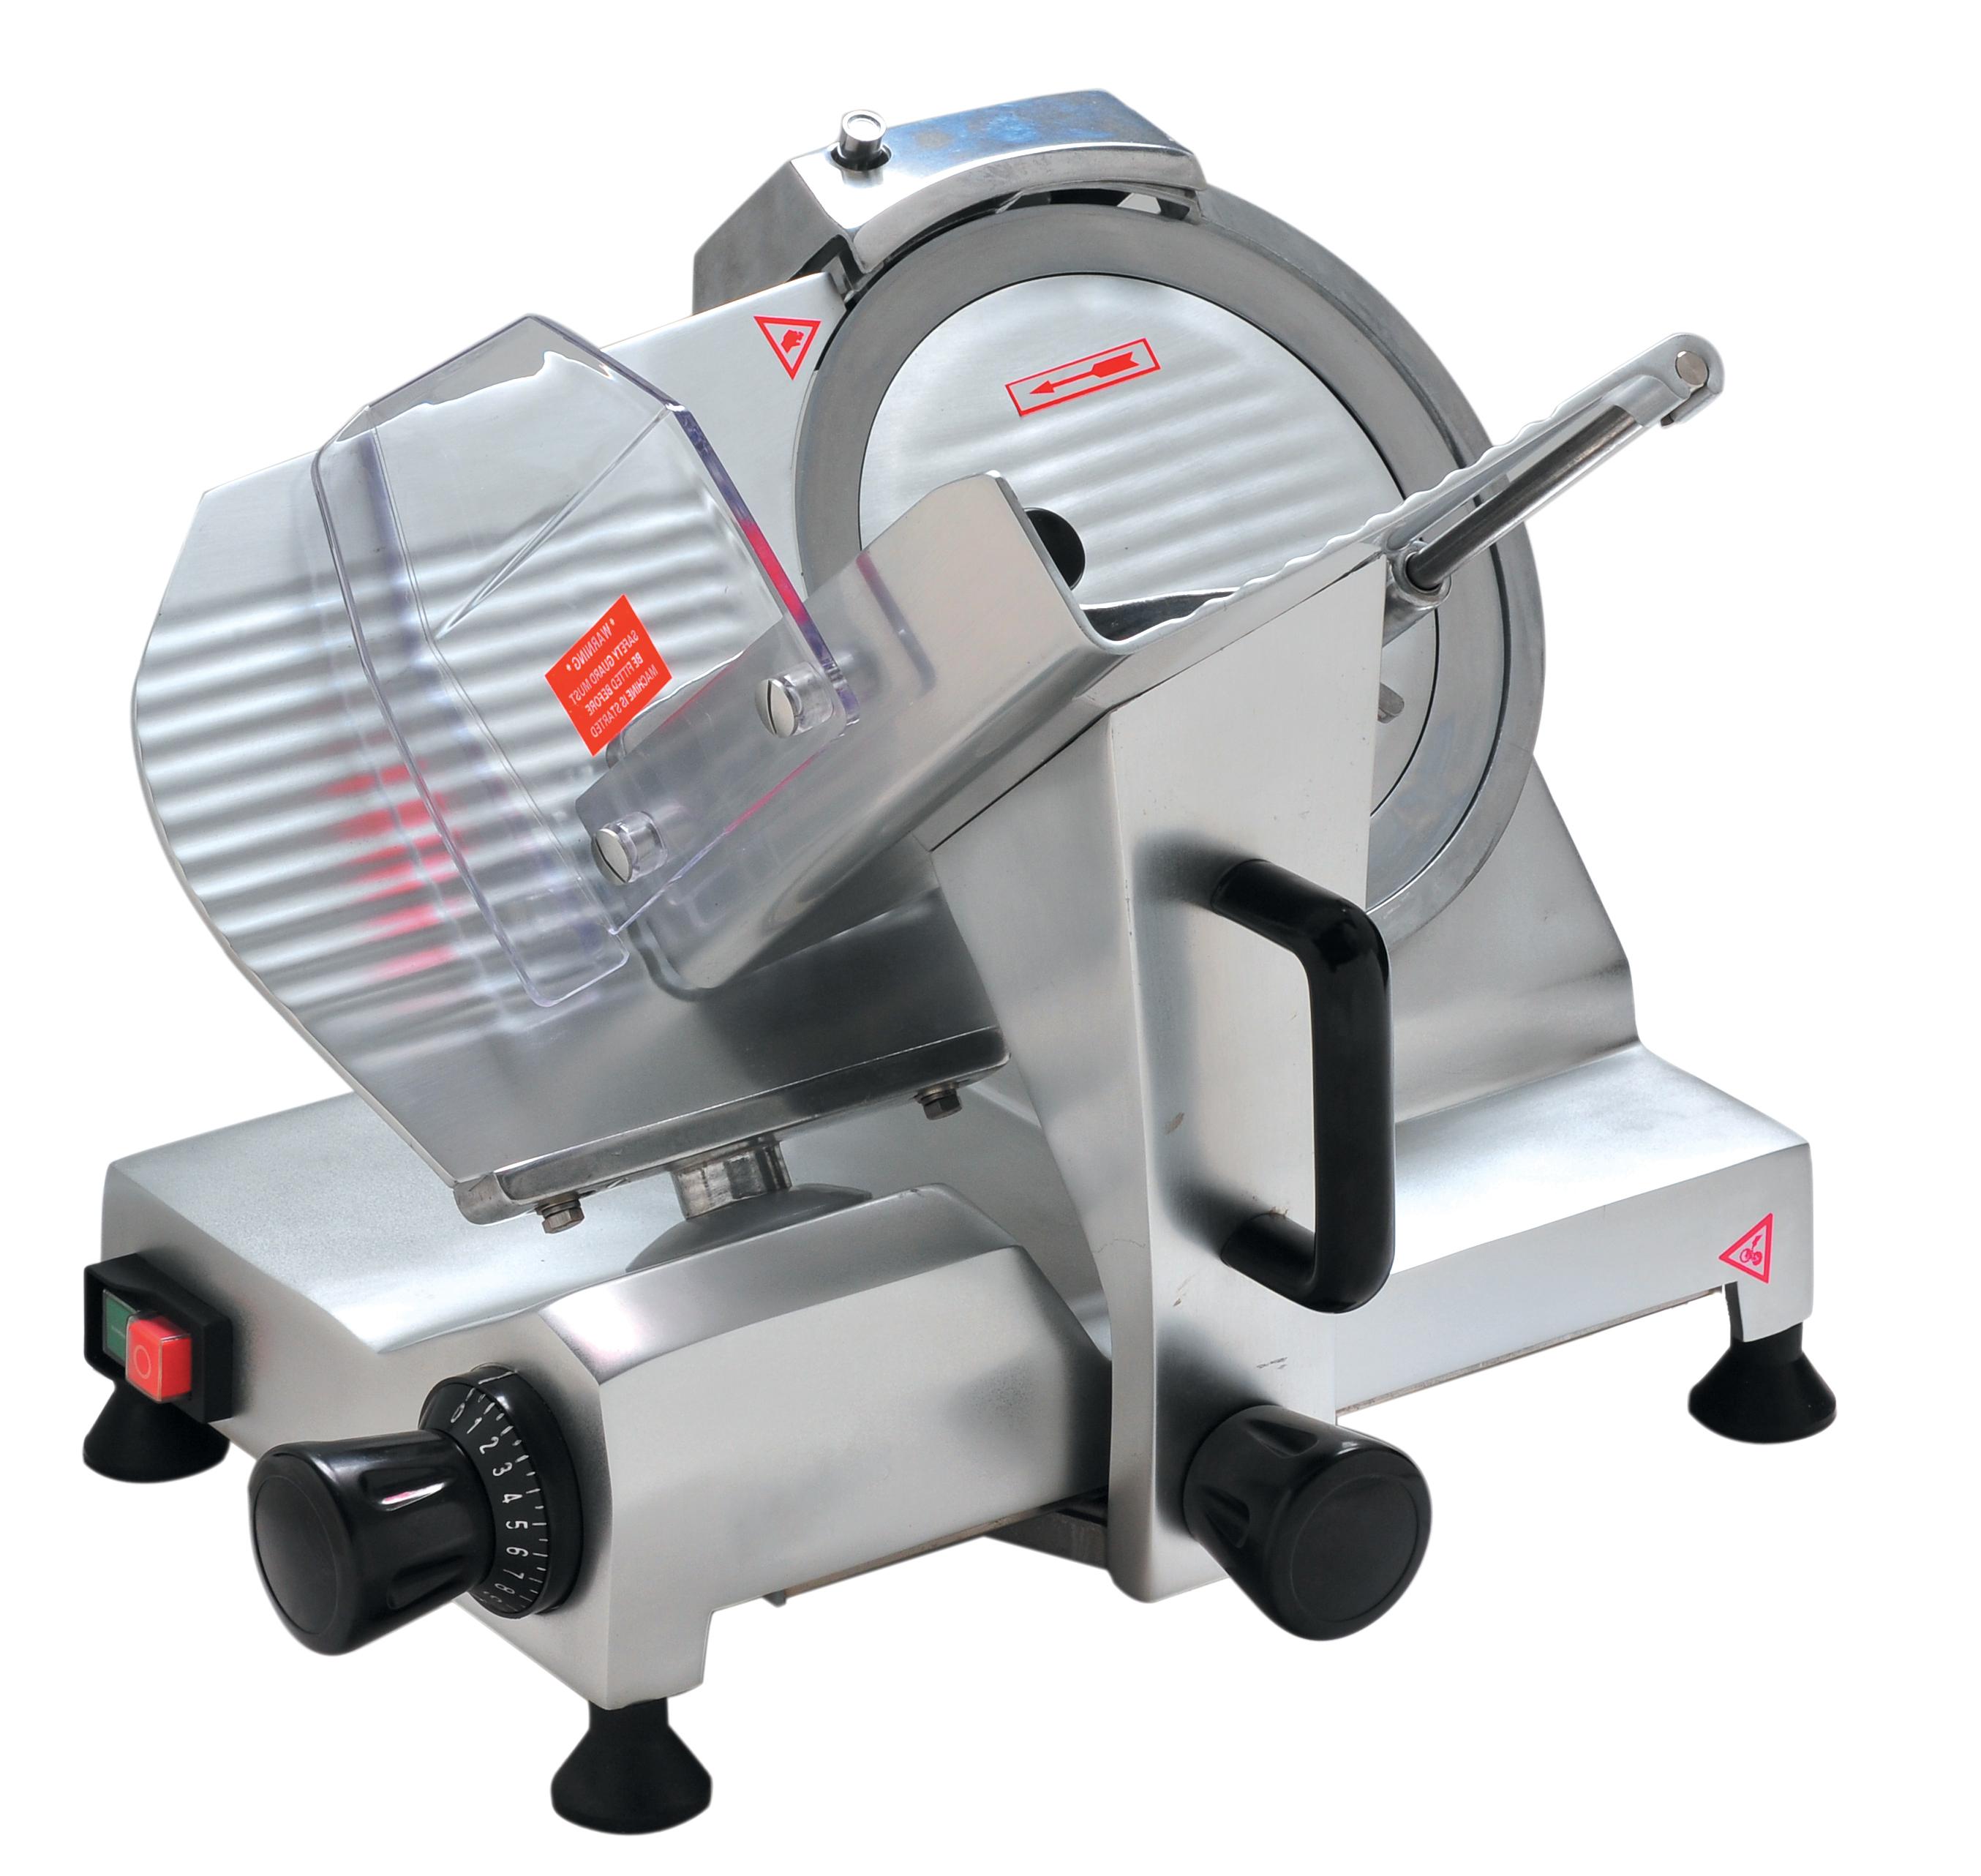 Omcan MS-CN-0250 food equipment > meat slicers > 10-inch blade slicers